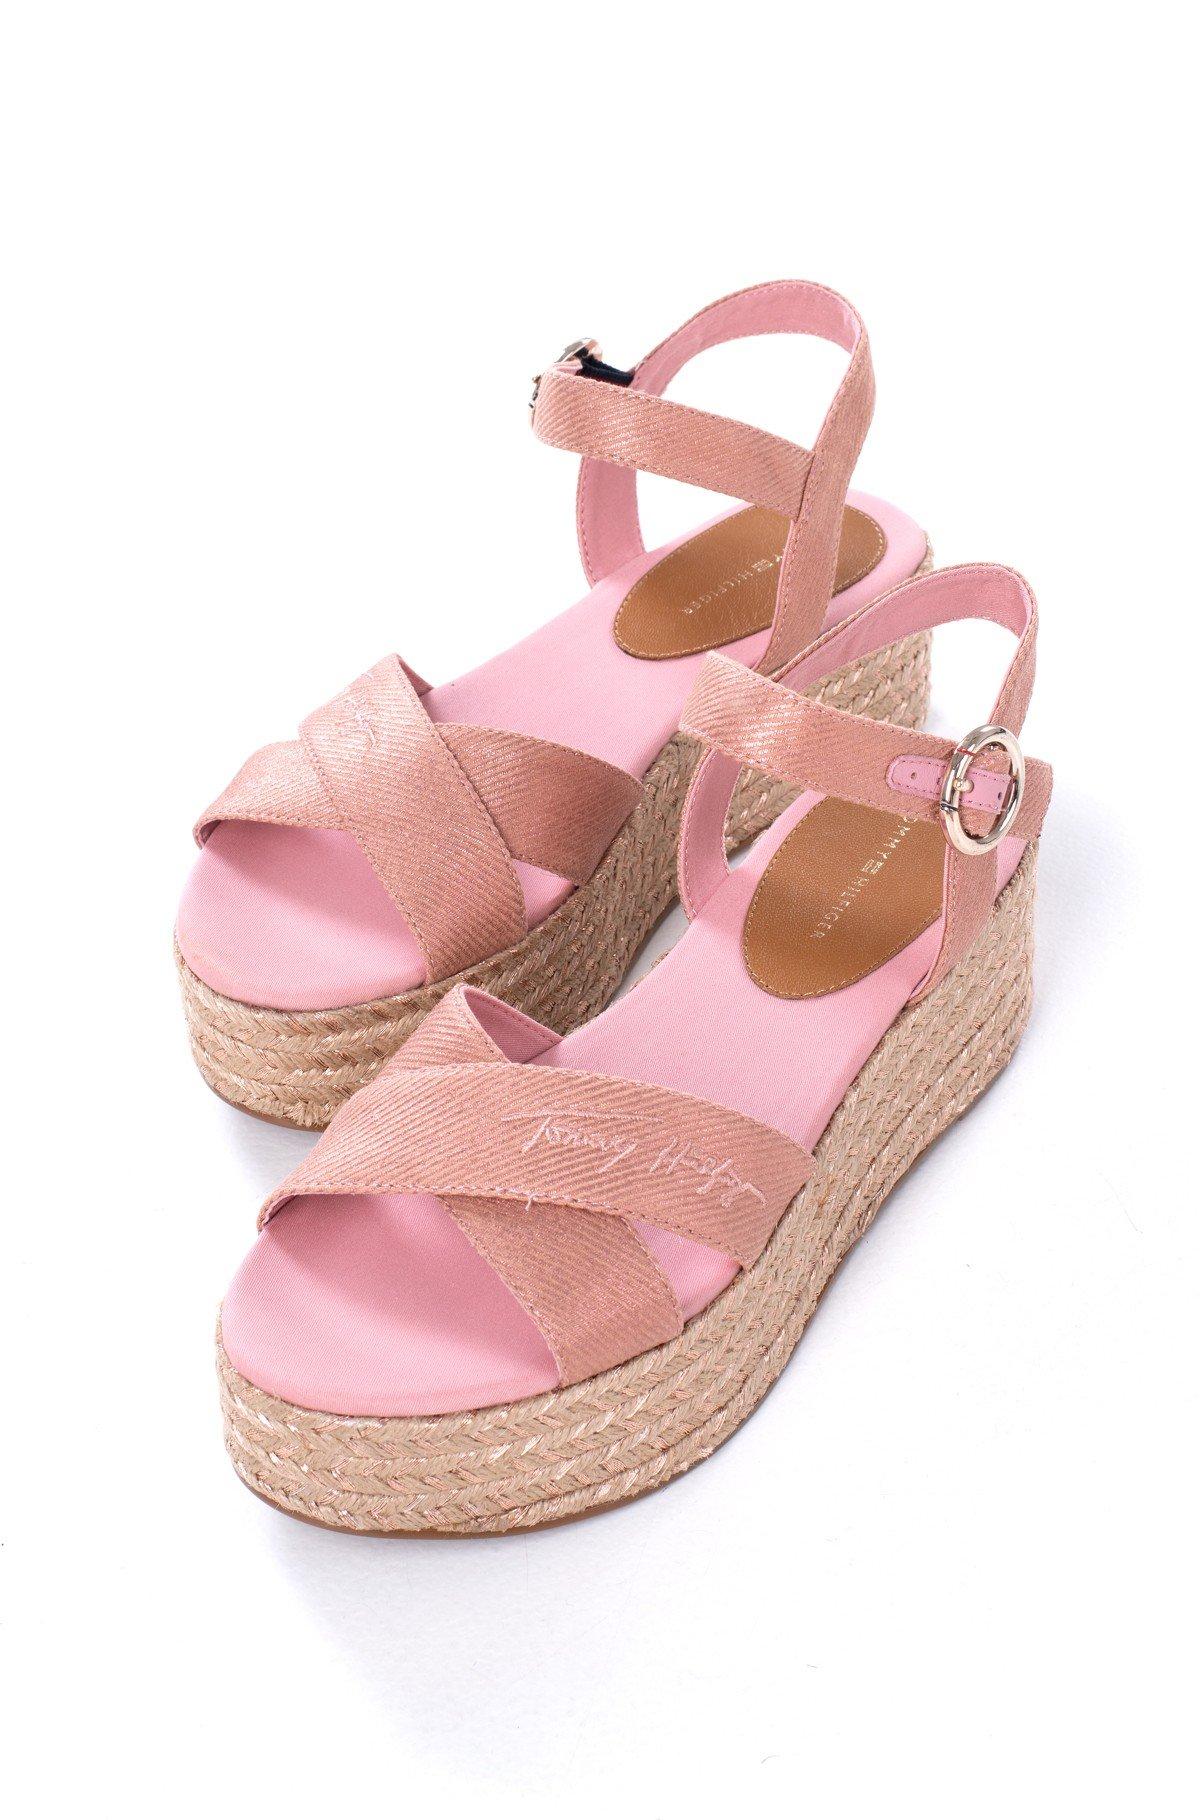 Platform shoes TH SIGNATURE FLATFORM SANDAL-full-1